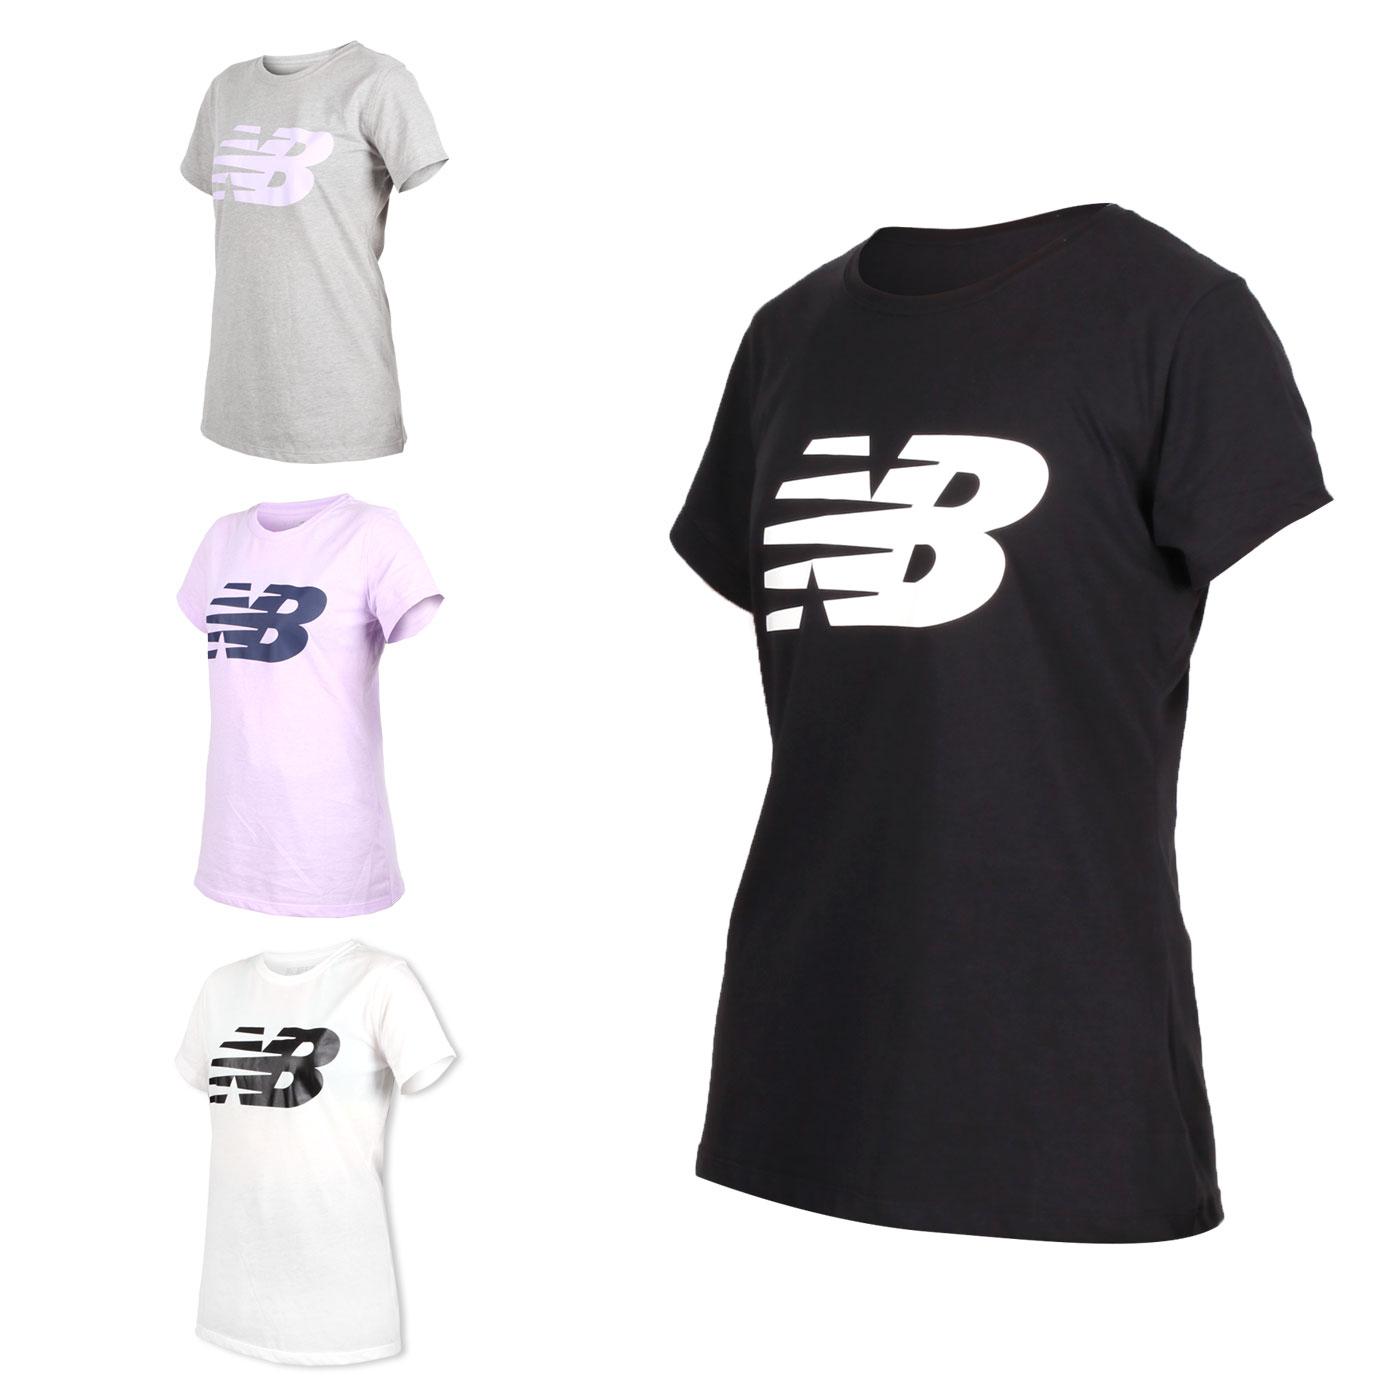 NEW BALANCE 女款短袖T恤 WT91842WT